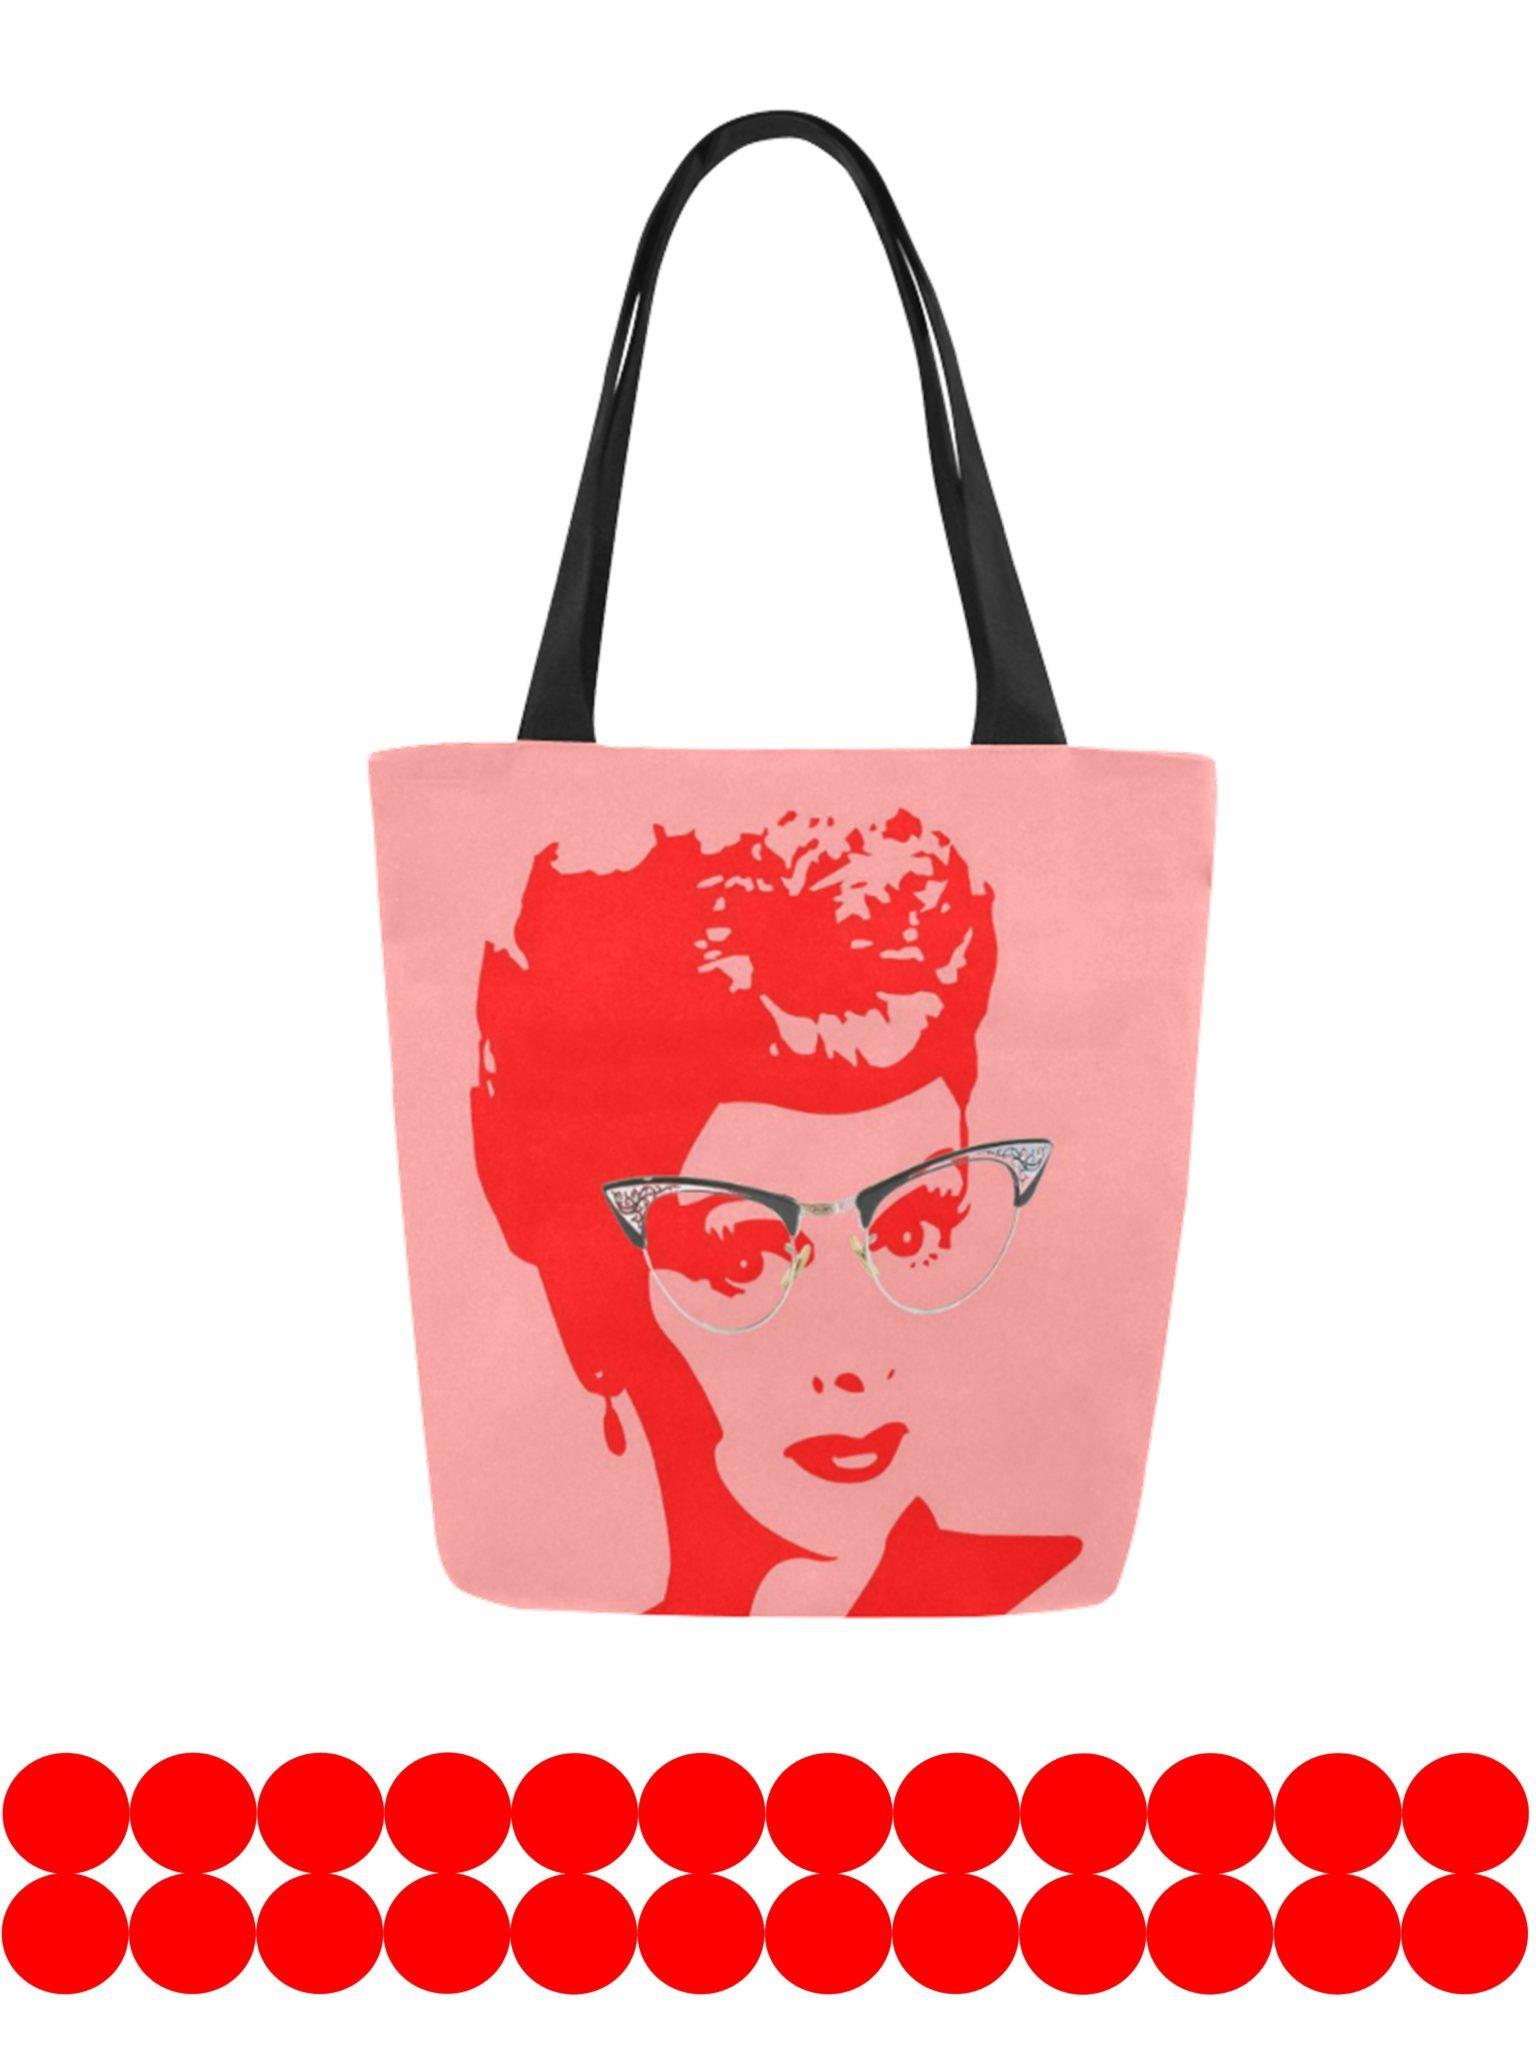 lucy canvas tote bag original design kayci garline wheatley. Black Bedroom Furniture Sets. Home Design Ideas